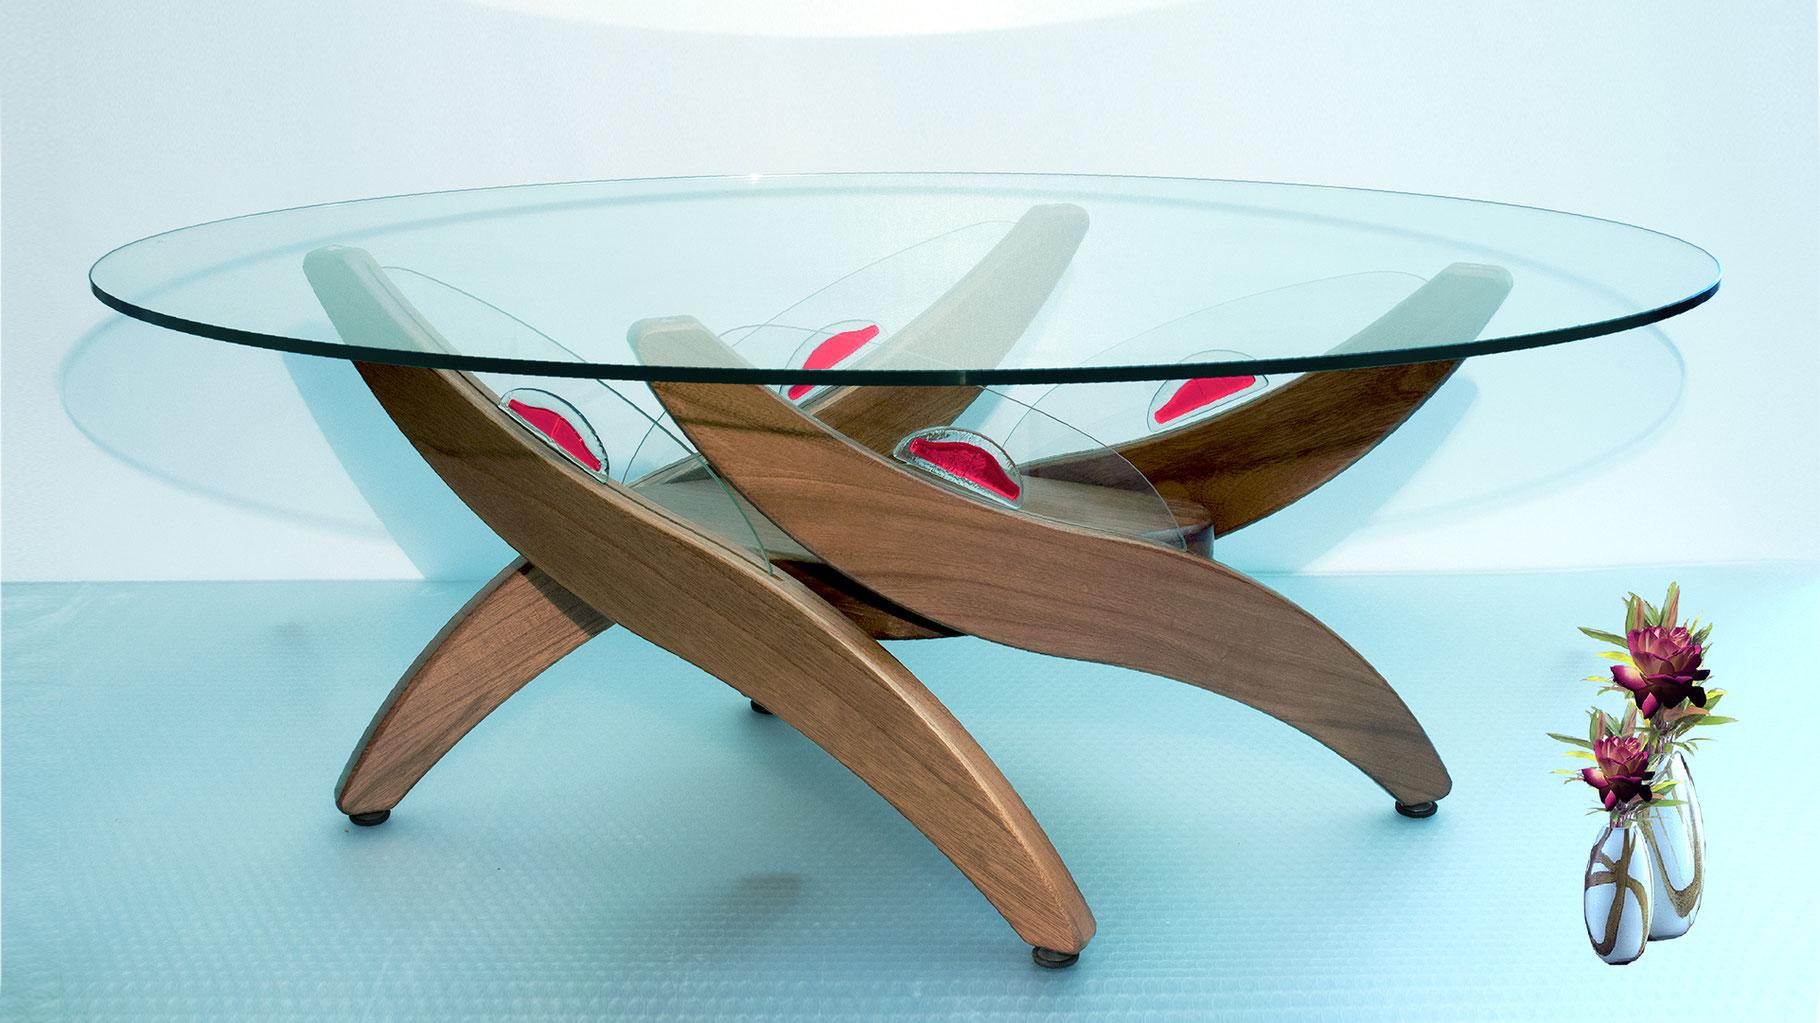 Tavolino Salotto Verde : Tavolino salotto mod. style con murrine benvenuti su castileitalia